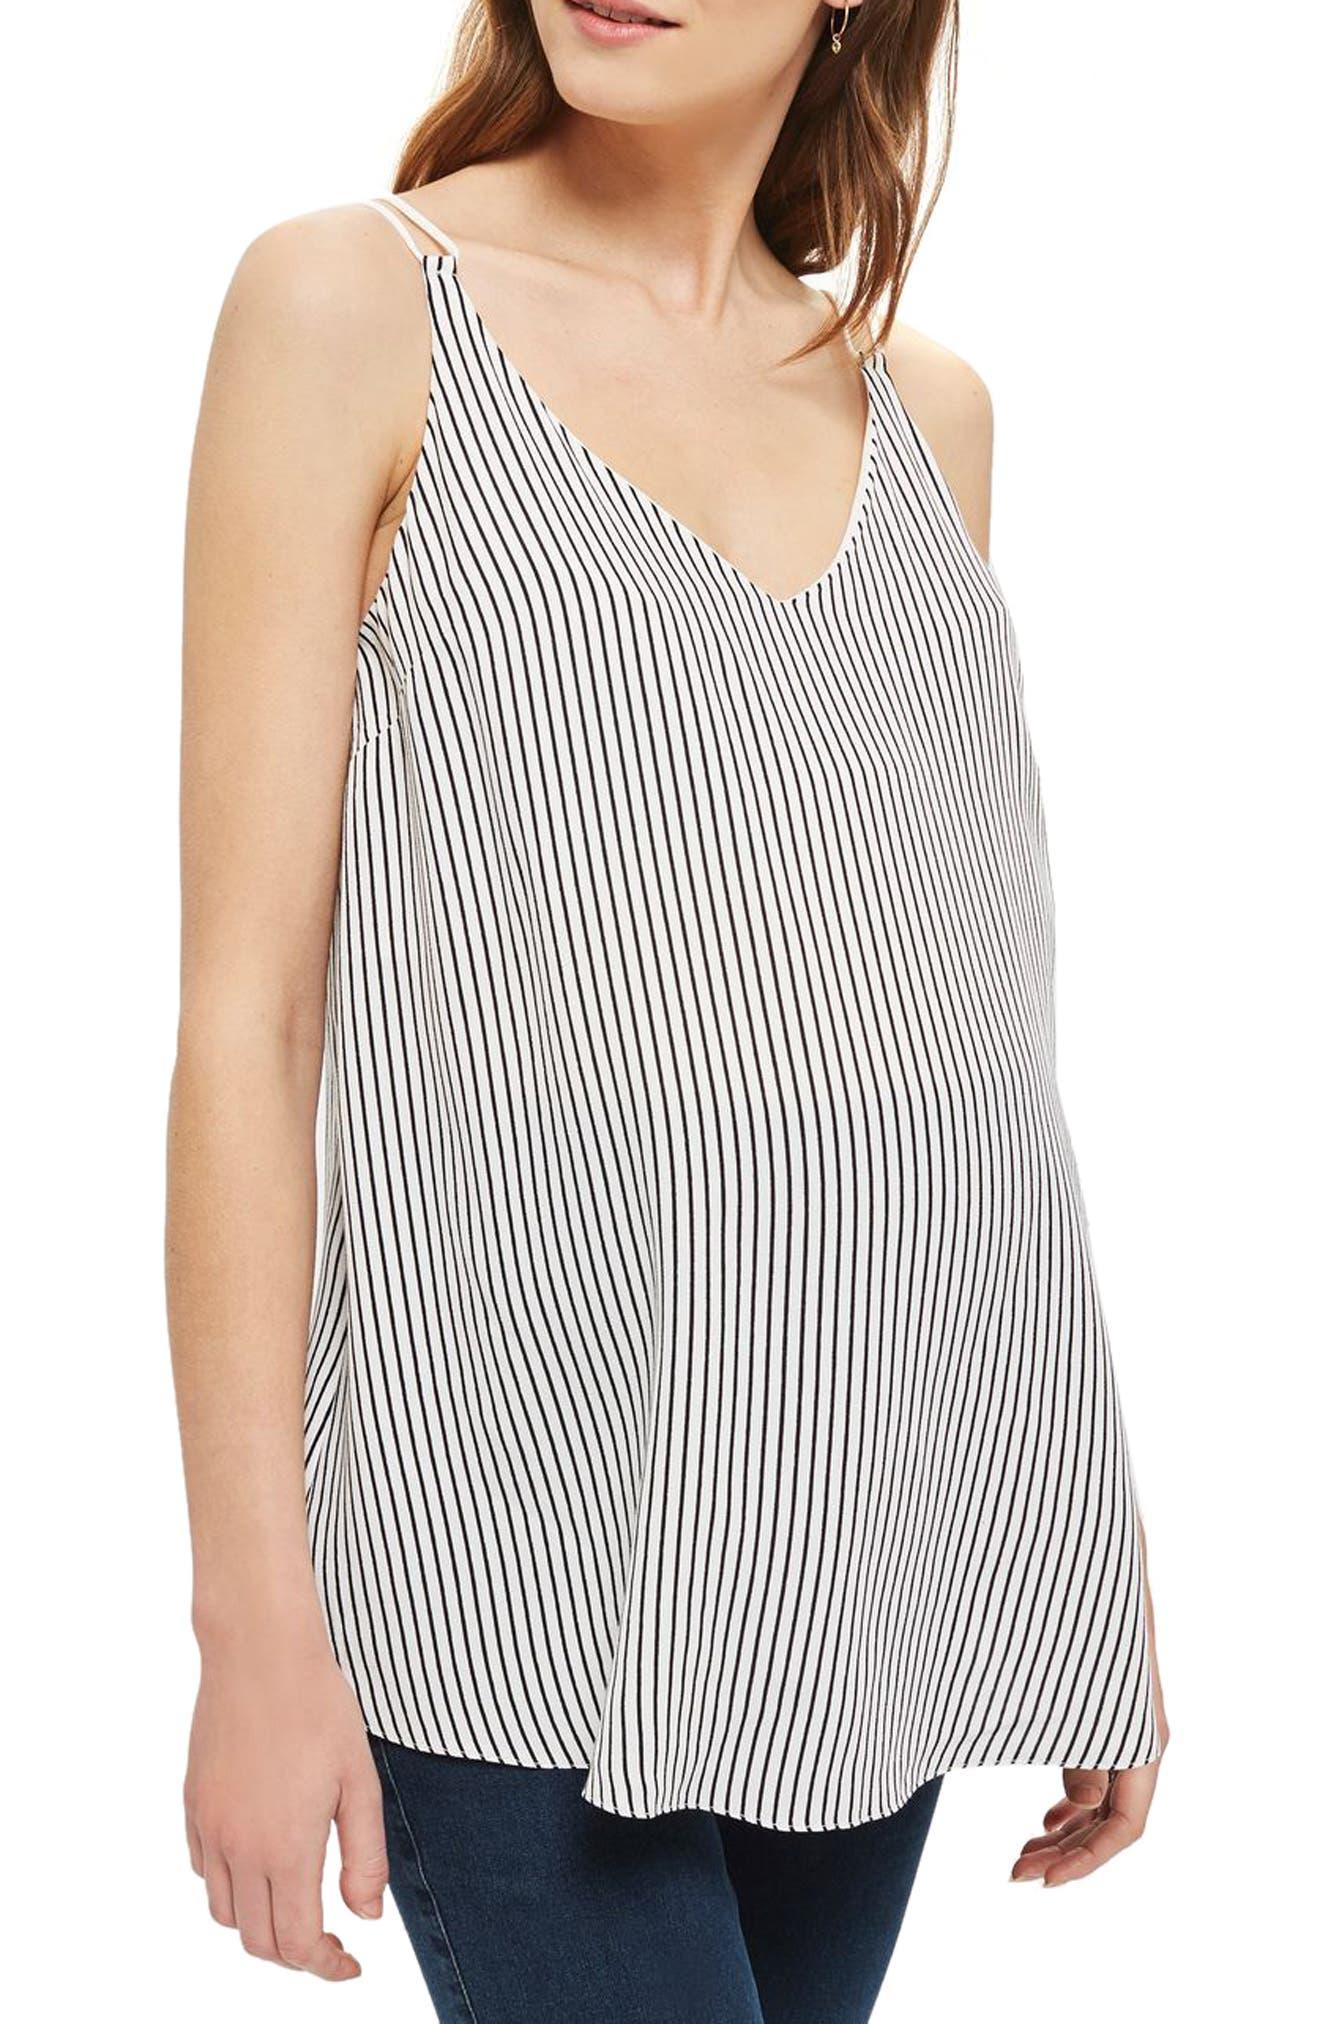 Topshop Stripe Swing Maternity Camisole